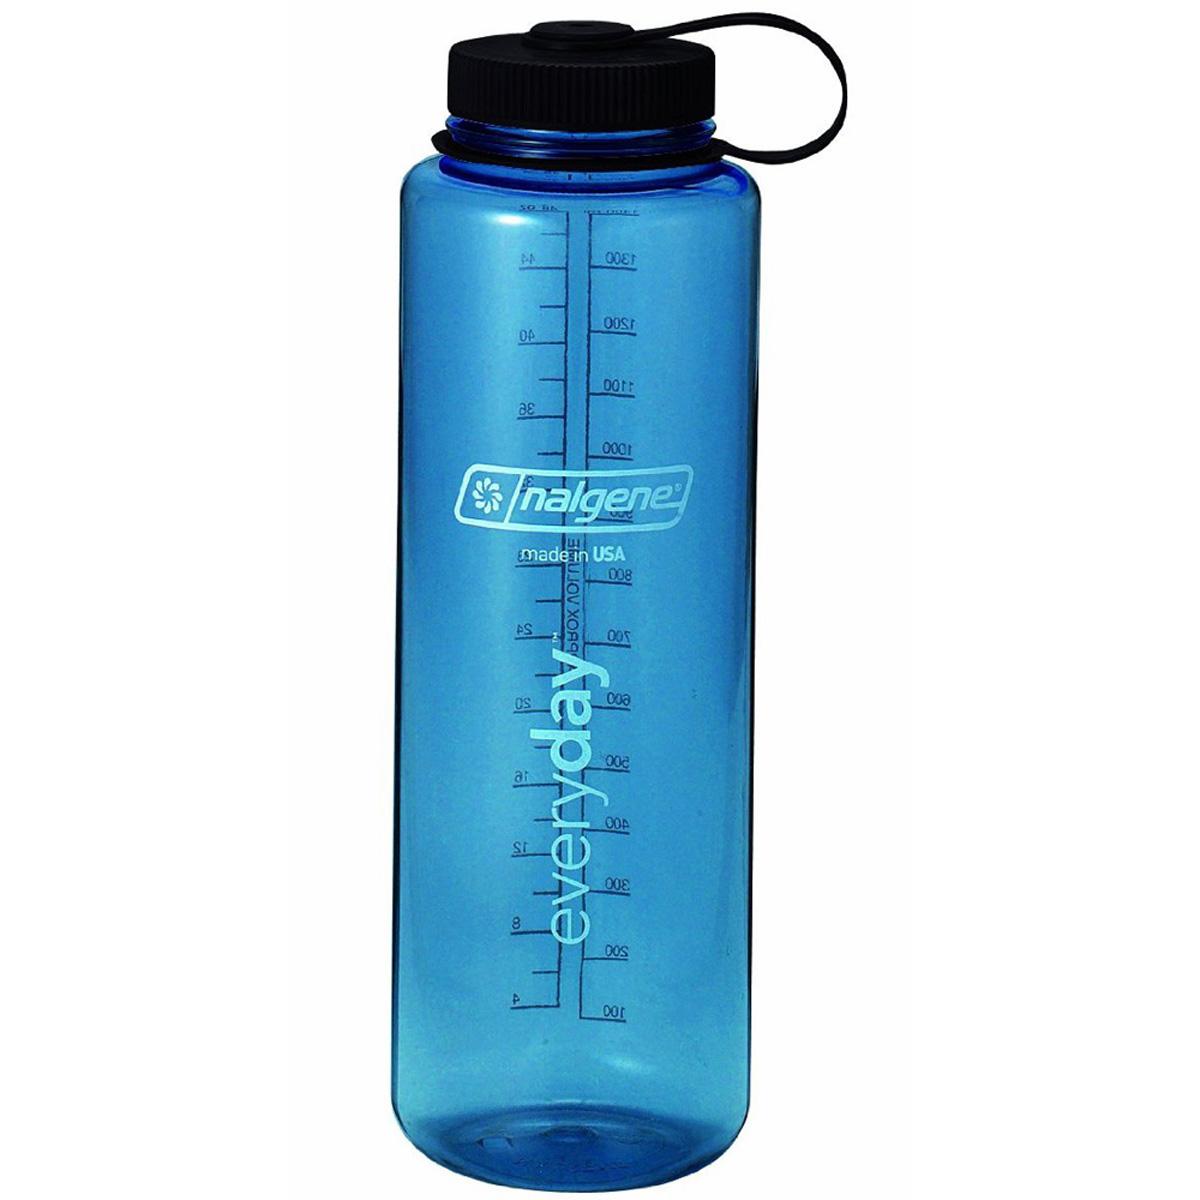 25b89d14f7 Details about Nalgene Tritan Wide Mouth Water Bottle - 48 oz. - Blue/Black